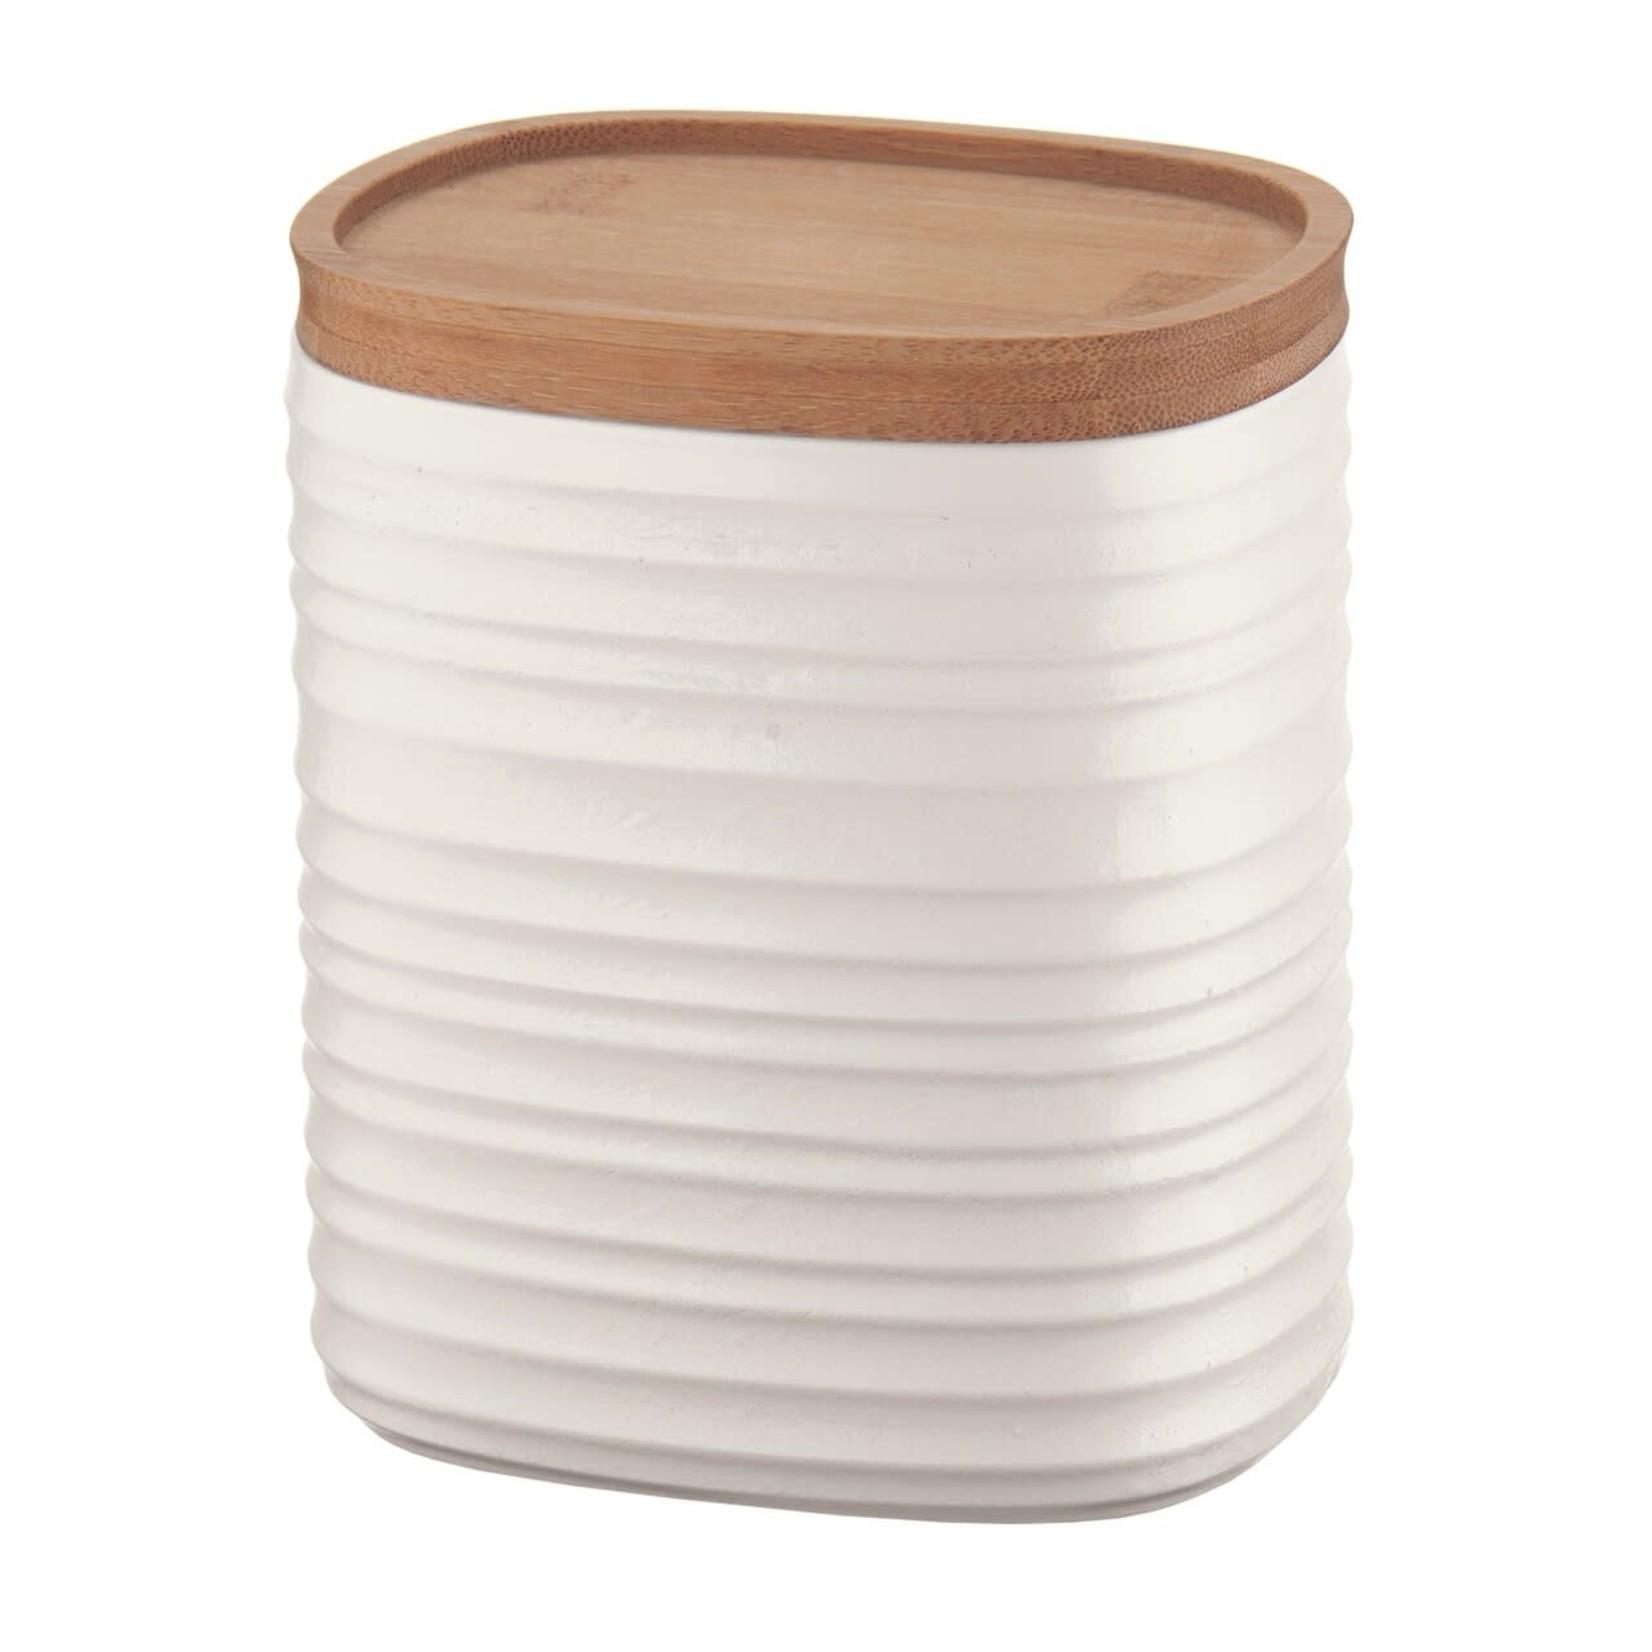 Guzzini Guzzini Storage Jar - Medium